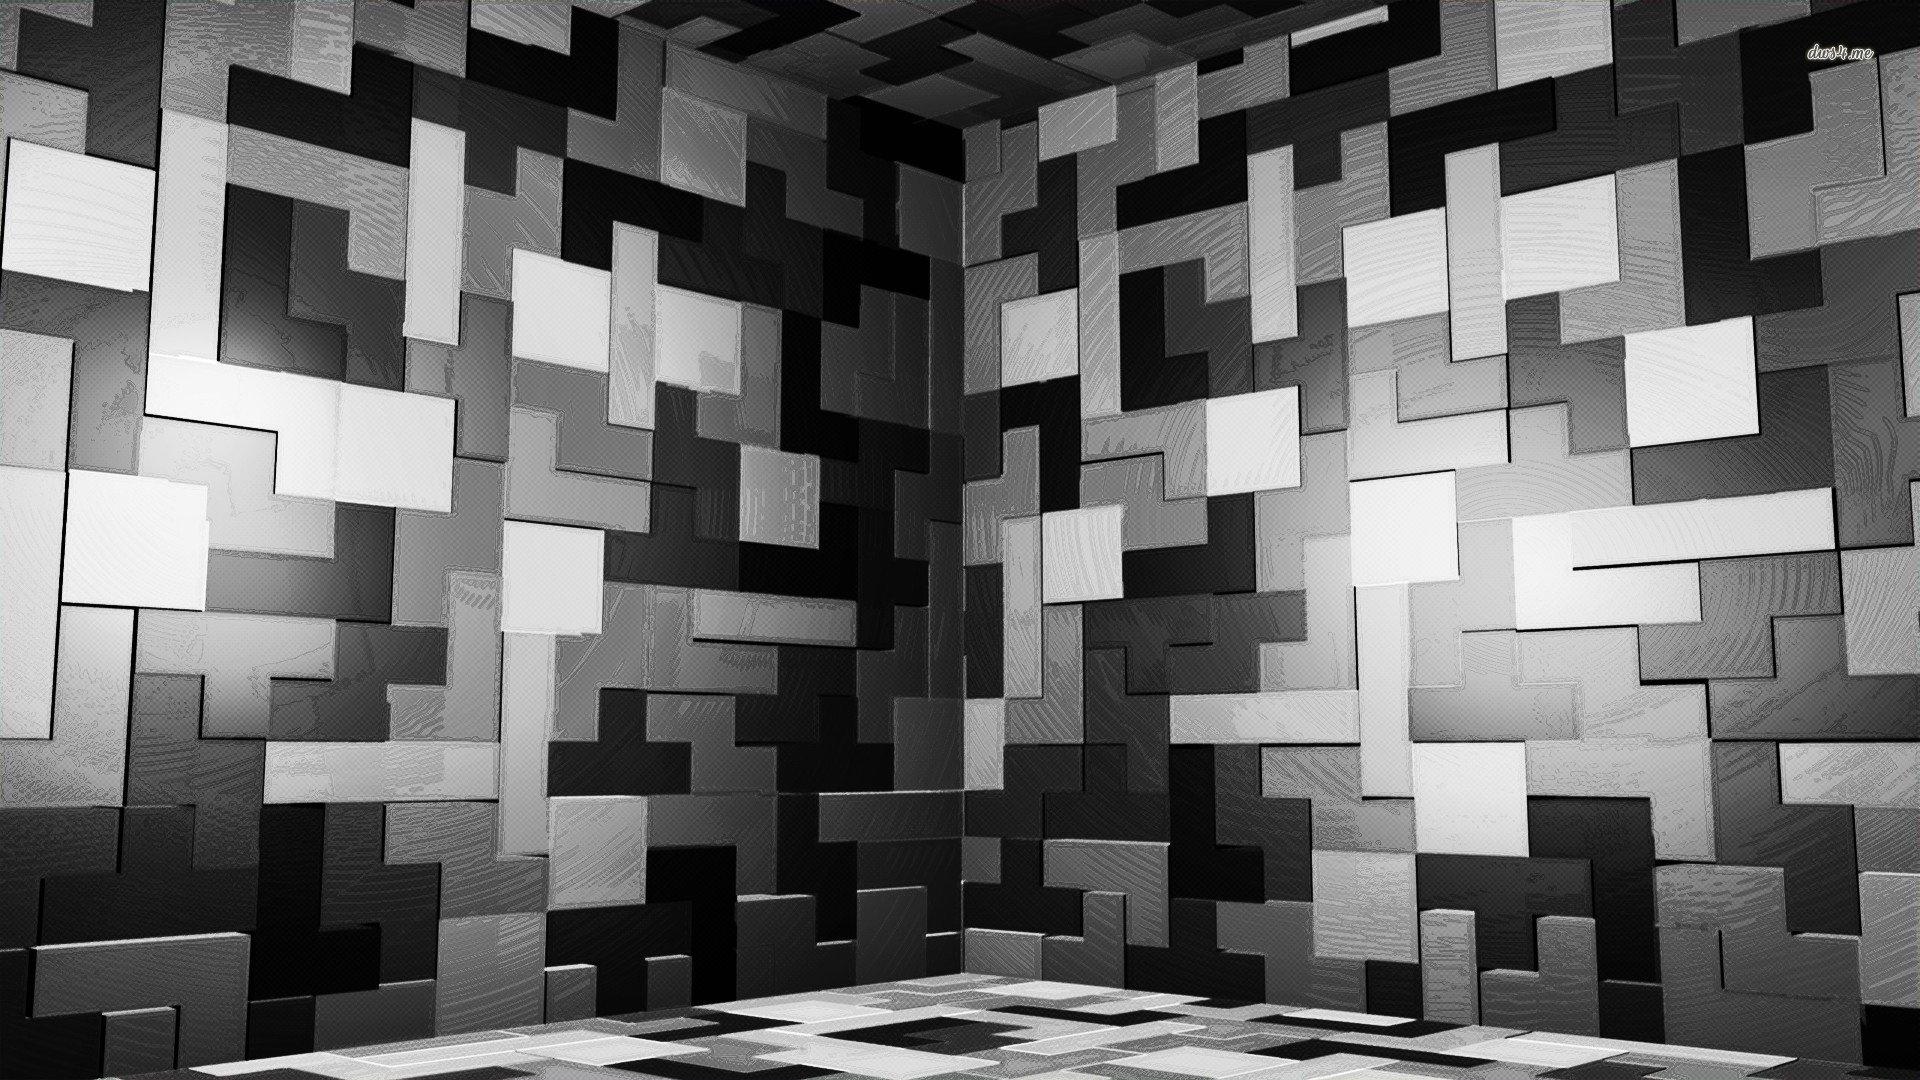 Minimalist Iphone Wallpaper Quotes Tetris Wallpaper Hd Pixelstalk Net